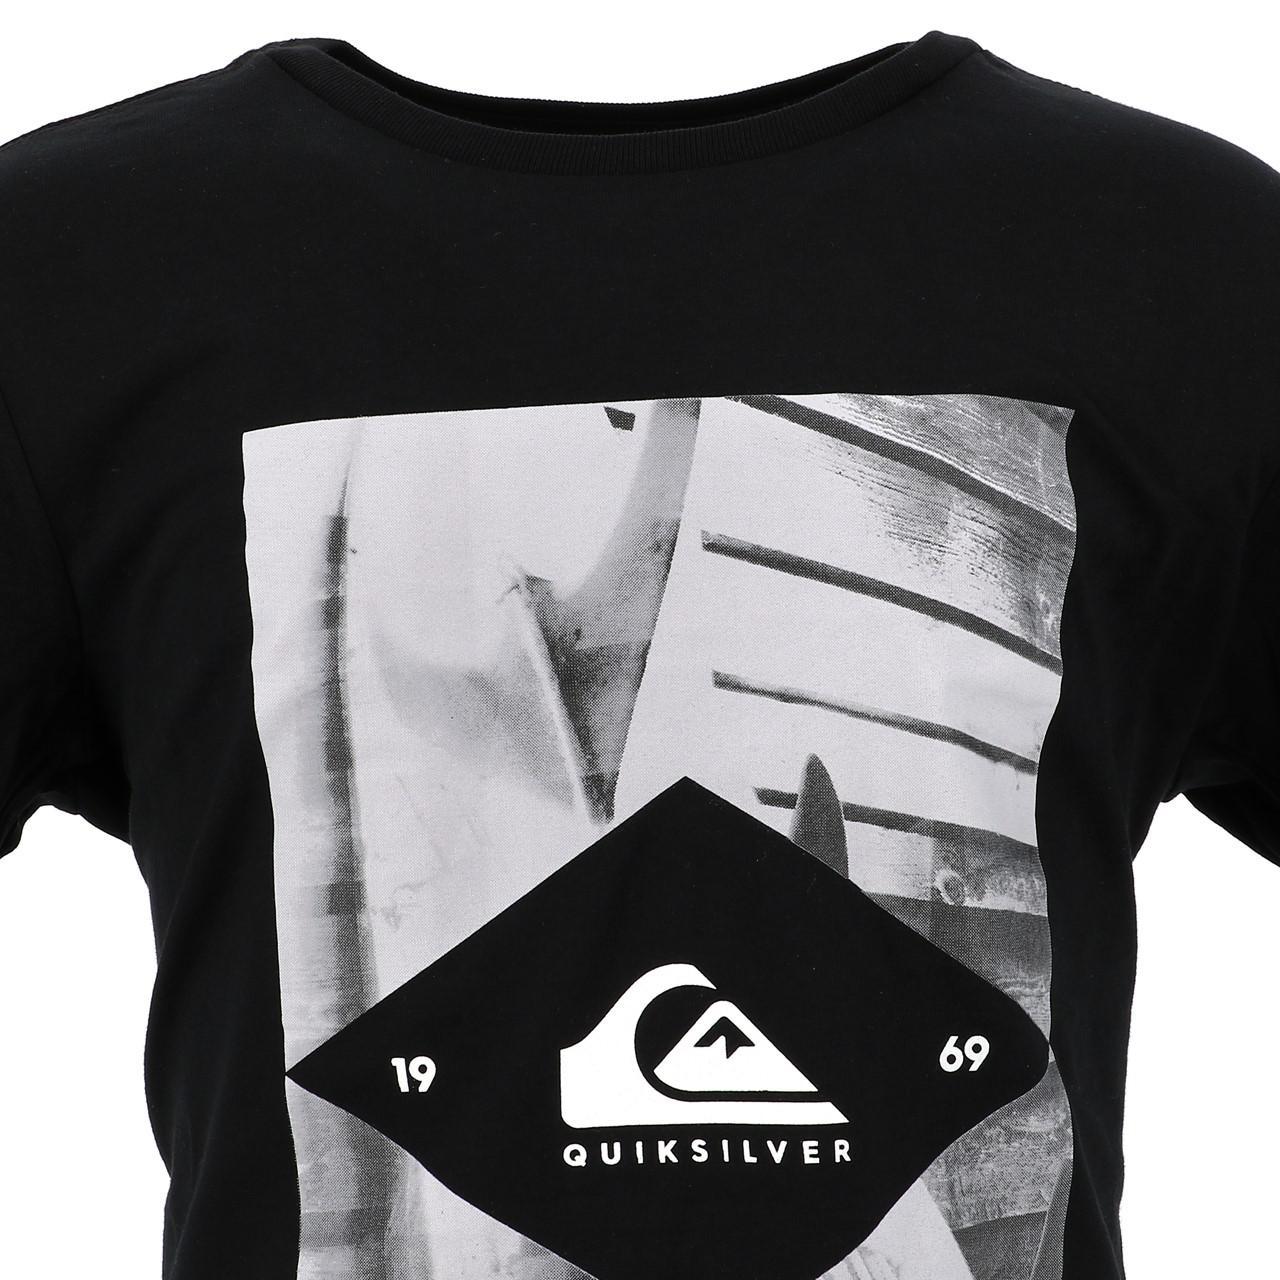 Tee-shirt-manches-courtes-Quiksilver-15341-flaxton-blk-jr-sp2-Noir-17517-Neuf miniature 2